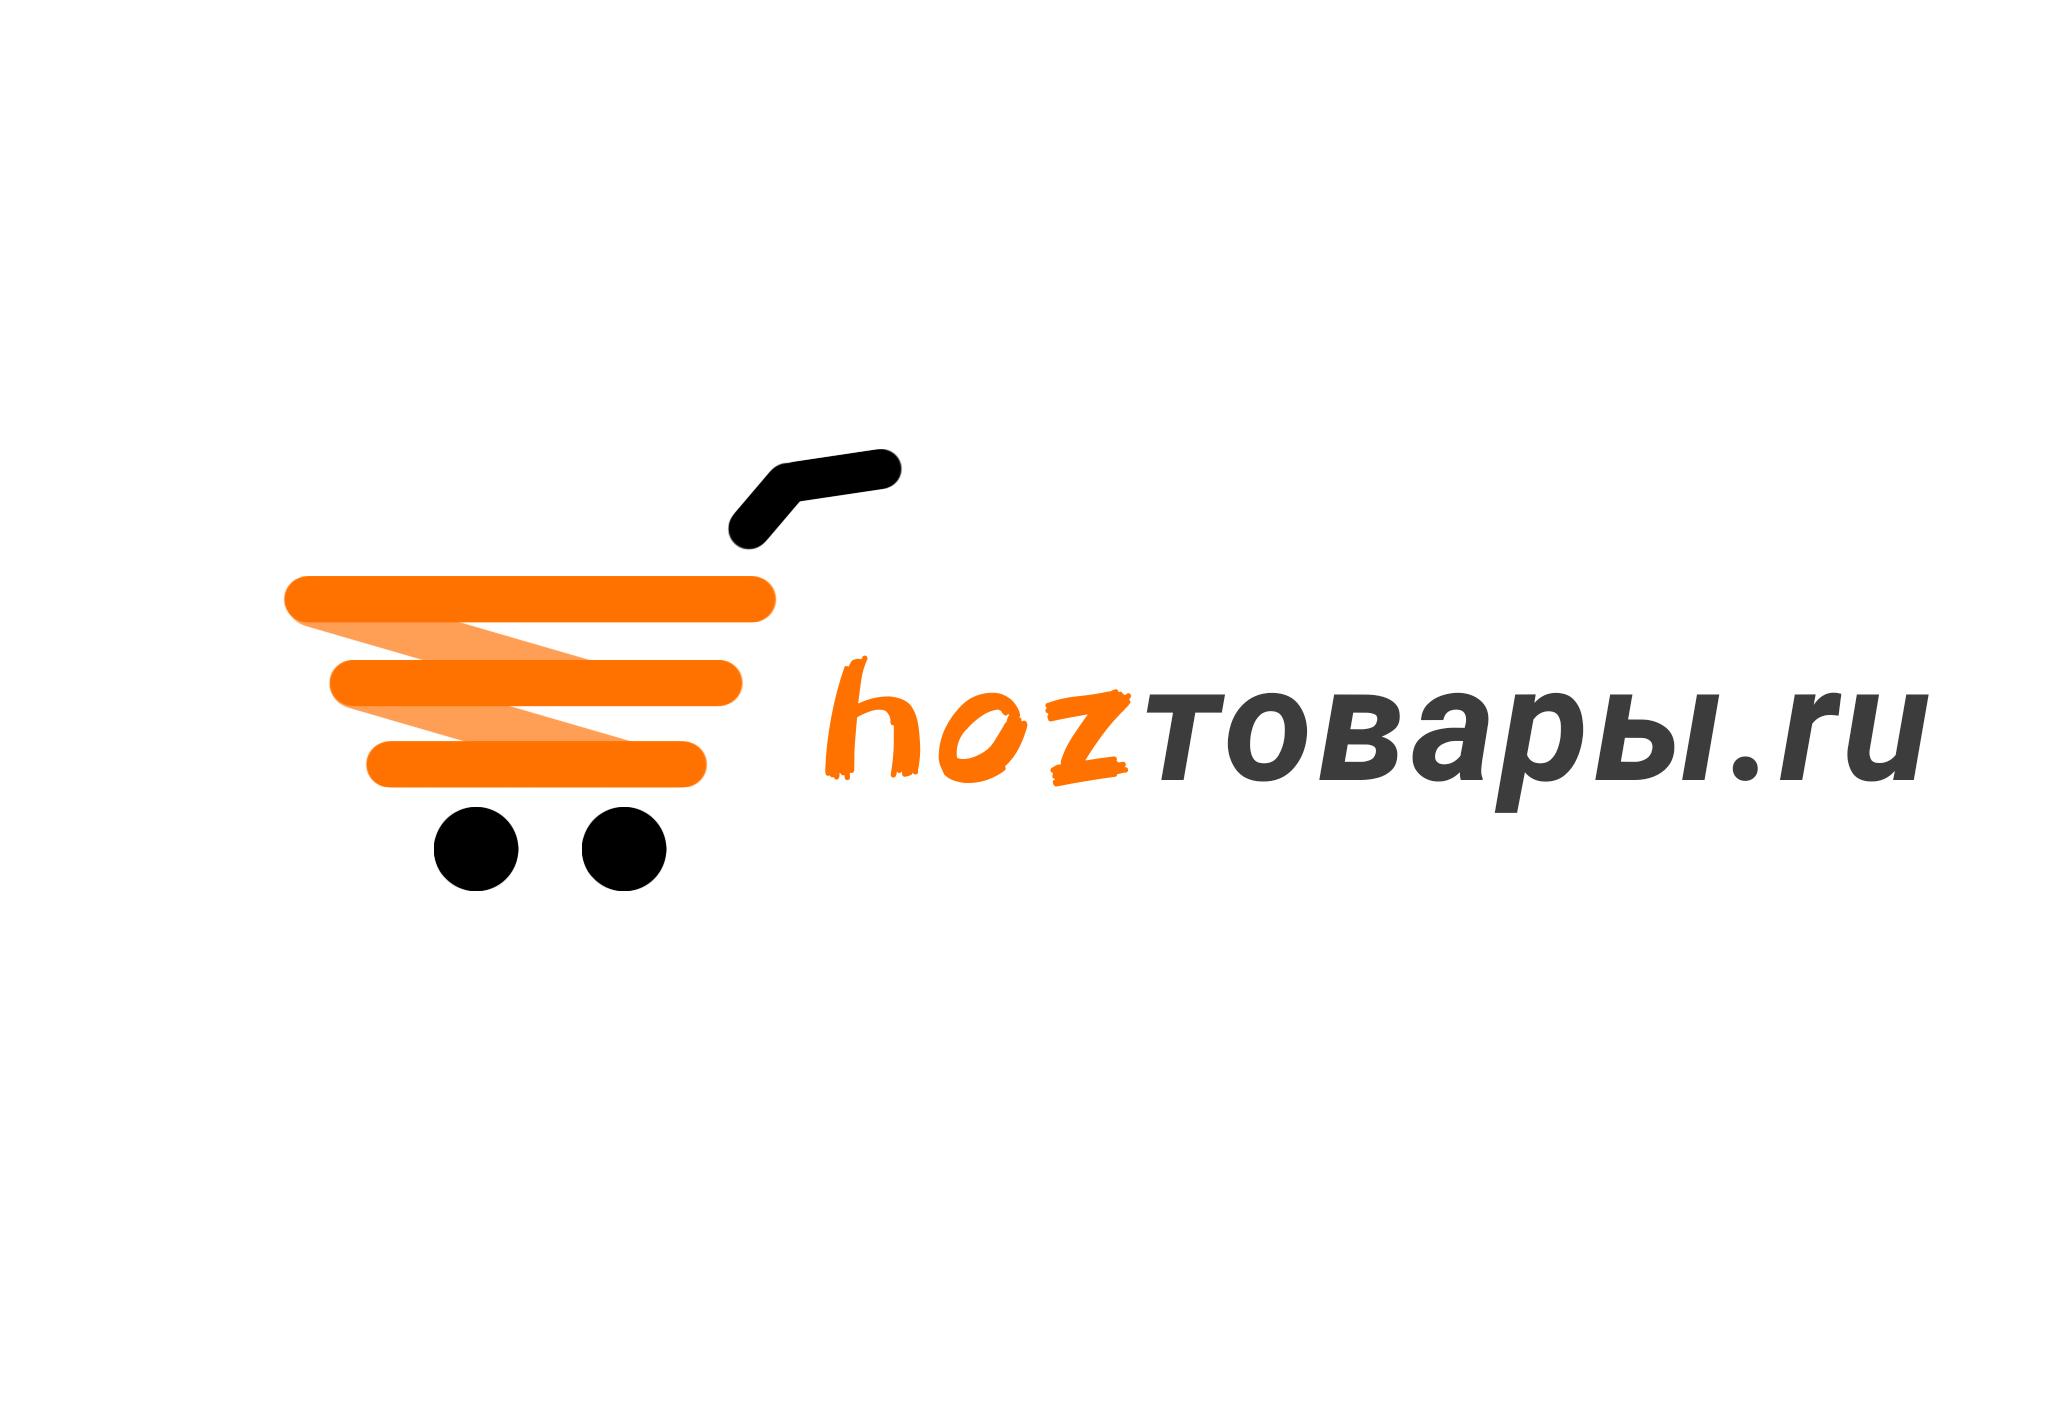 Разработка логотипа для оптового интернет-магазина «Хозтовары.ру» фото f_77260747f44bb540.png